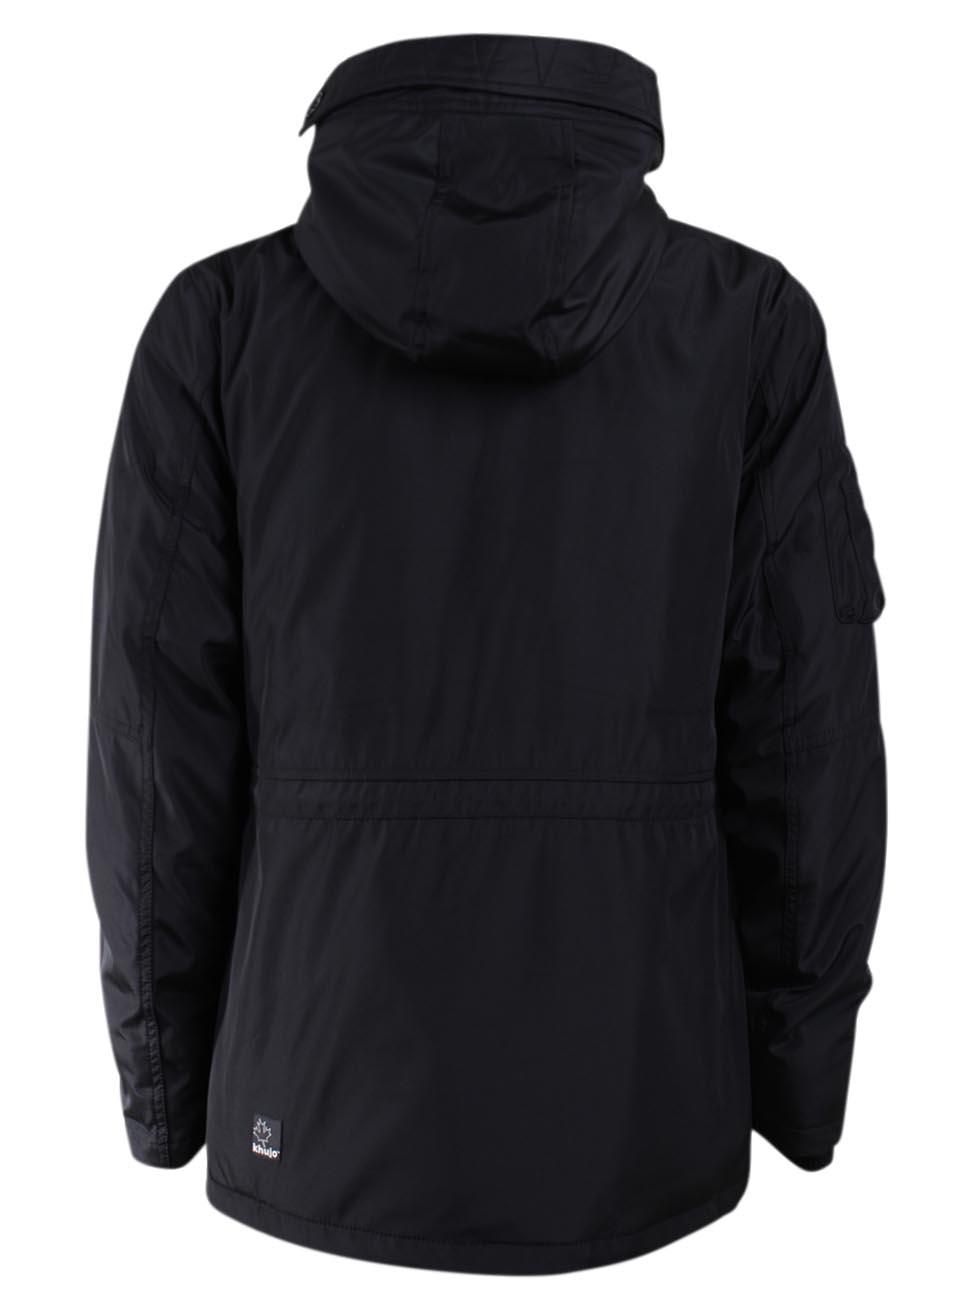 khujo herren winterjacke smart mit fester kapuze kaufen jeans direct de. Black Bedroom Furniture Sets. Home Design Ideas